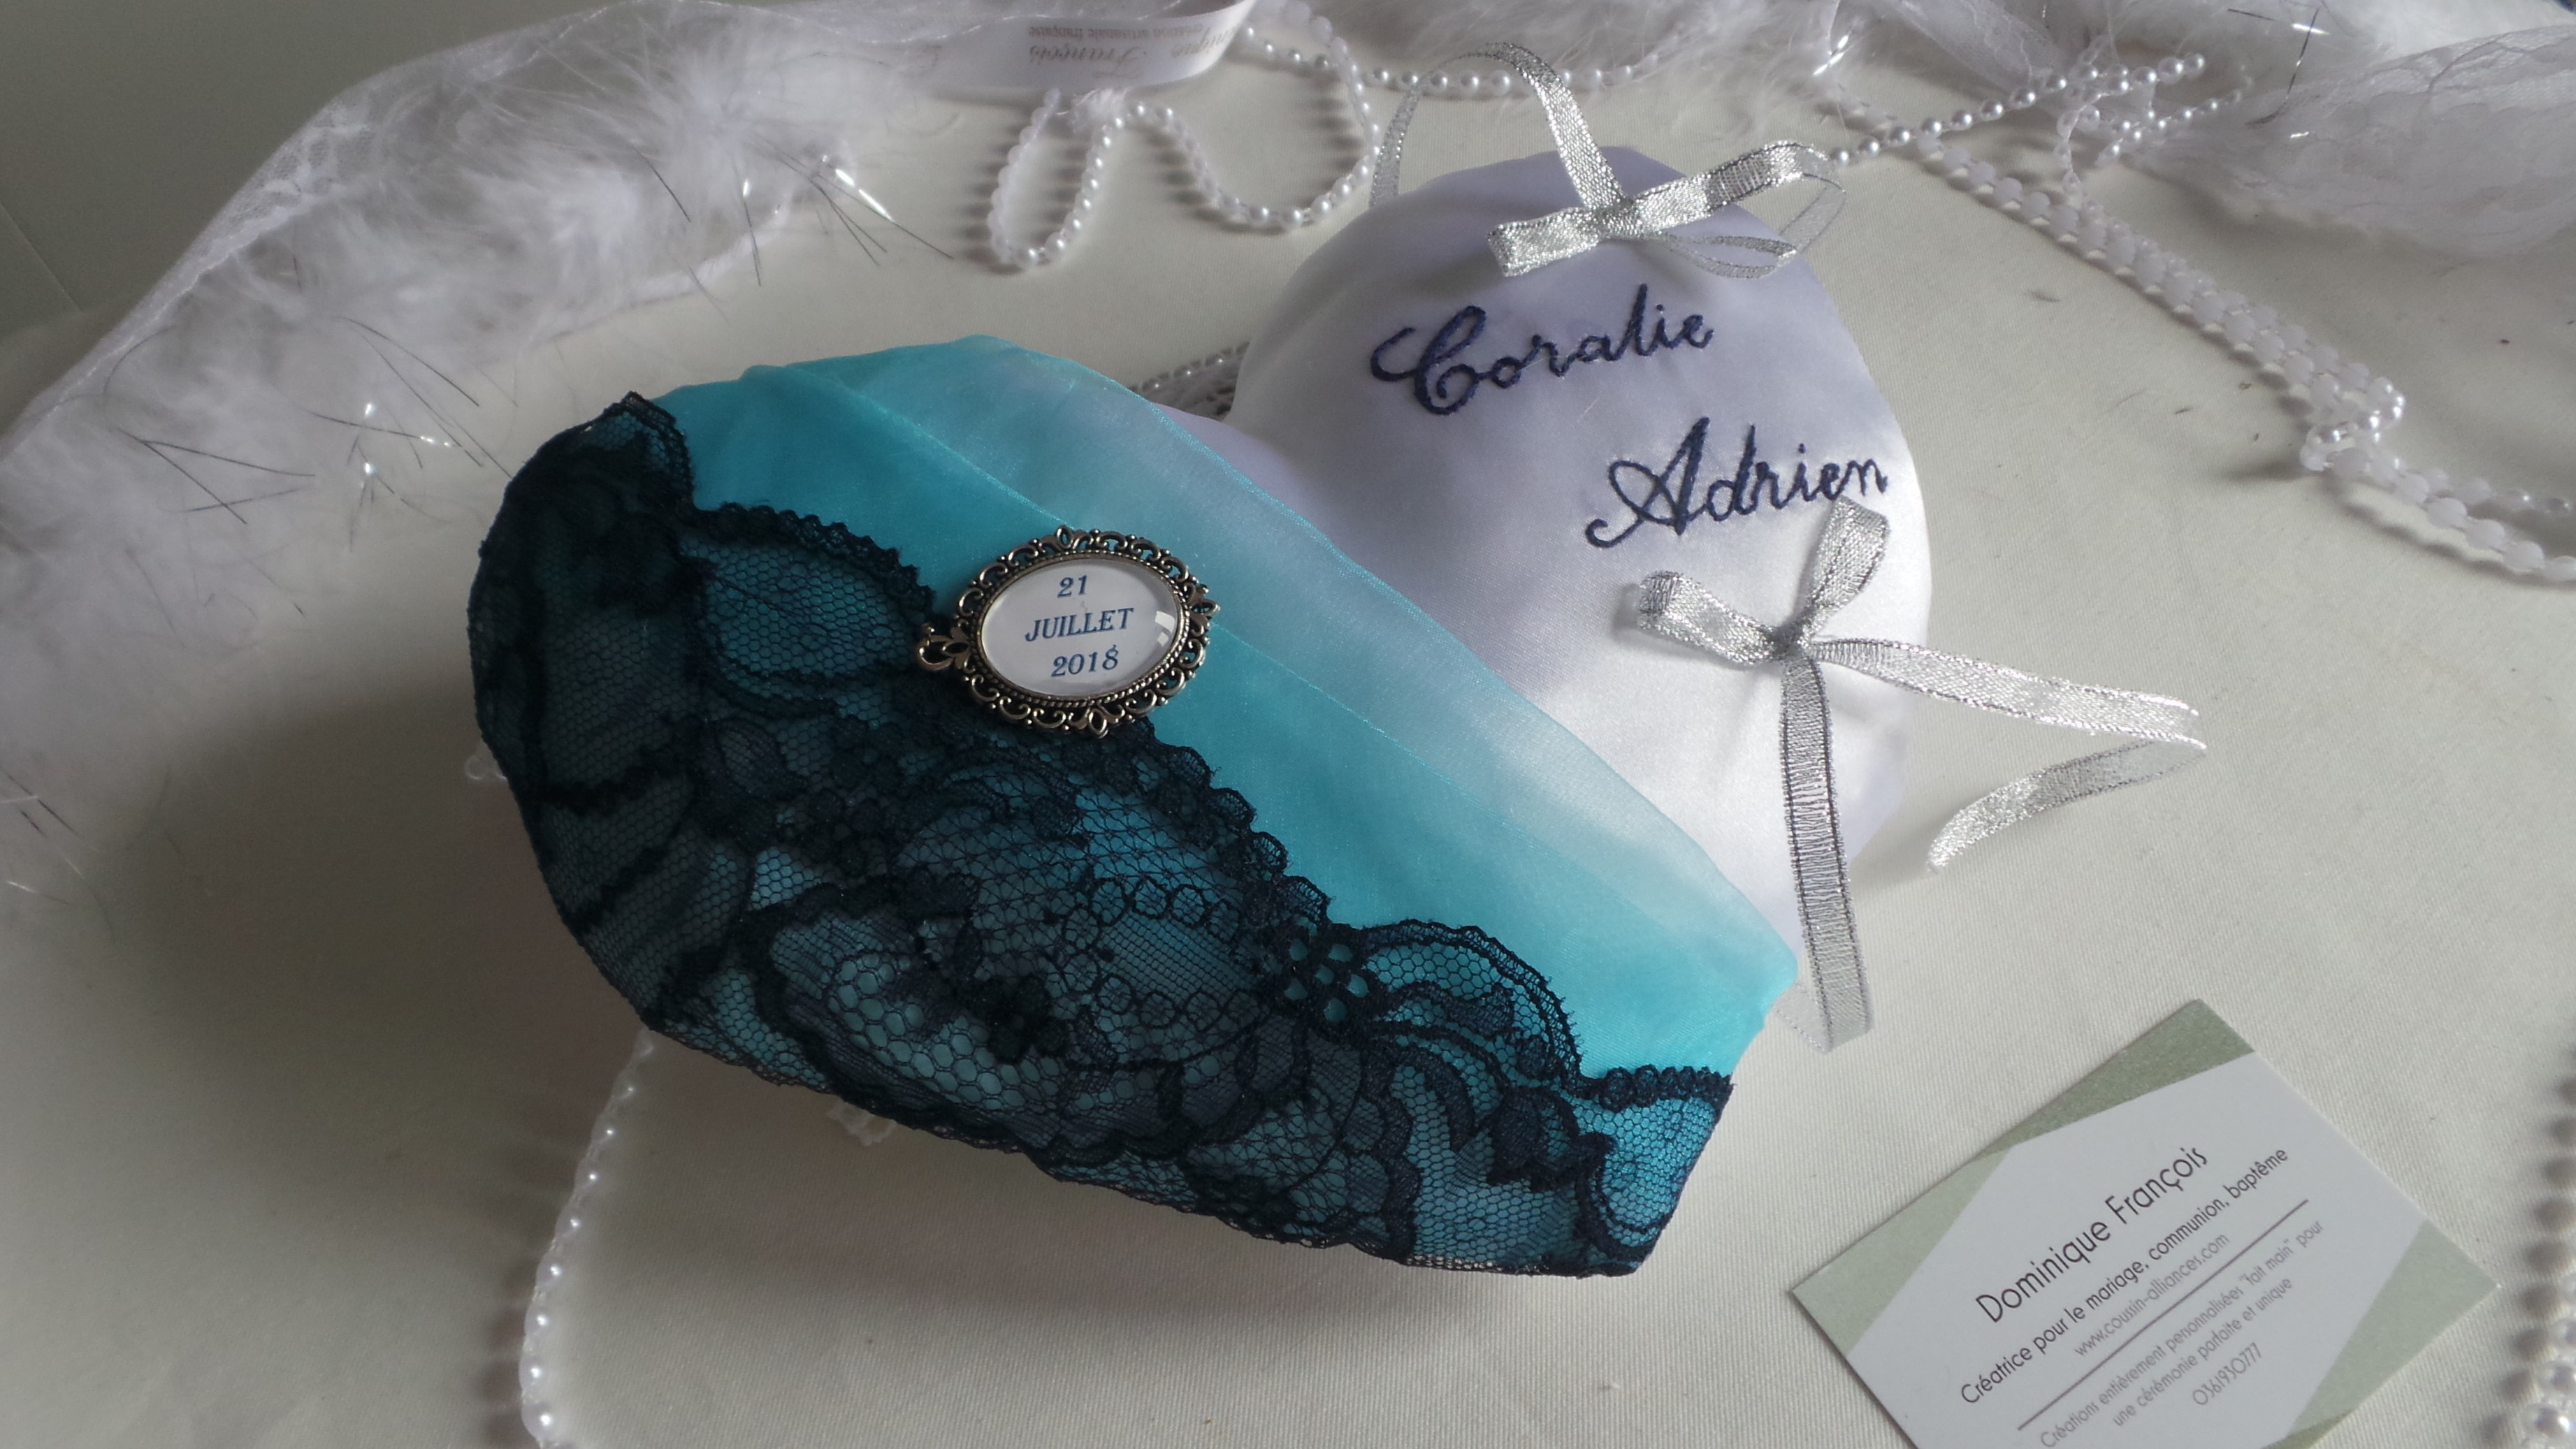 Coussin alliance personnalise coeur turquoise bleu marine fait main